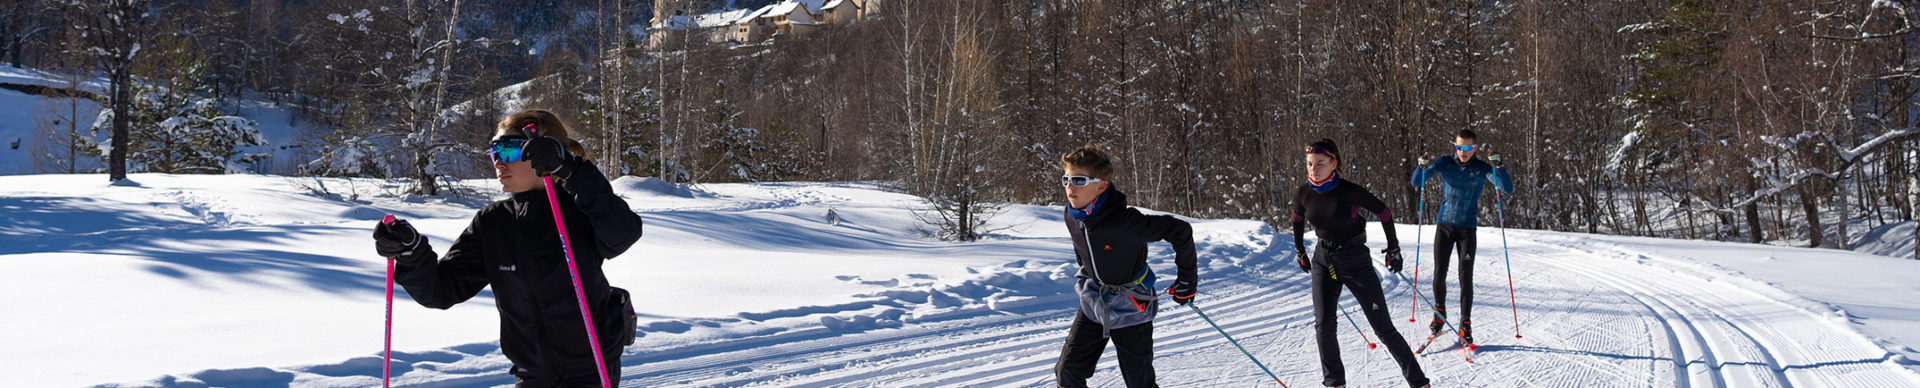 Ski de fond en Haute Ubaye ©AD04-Rogier Van Rijn